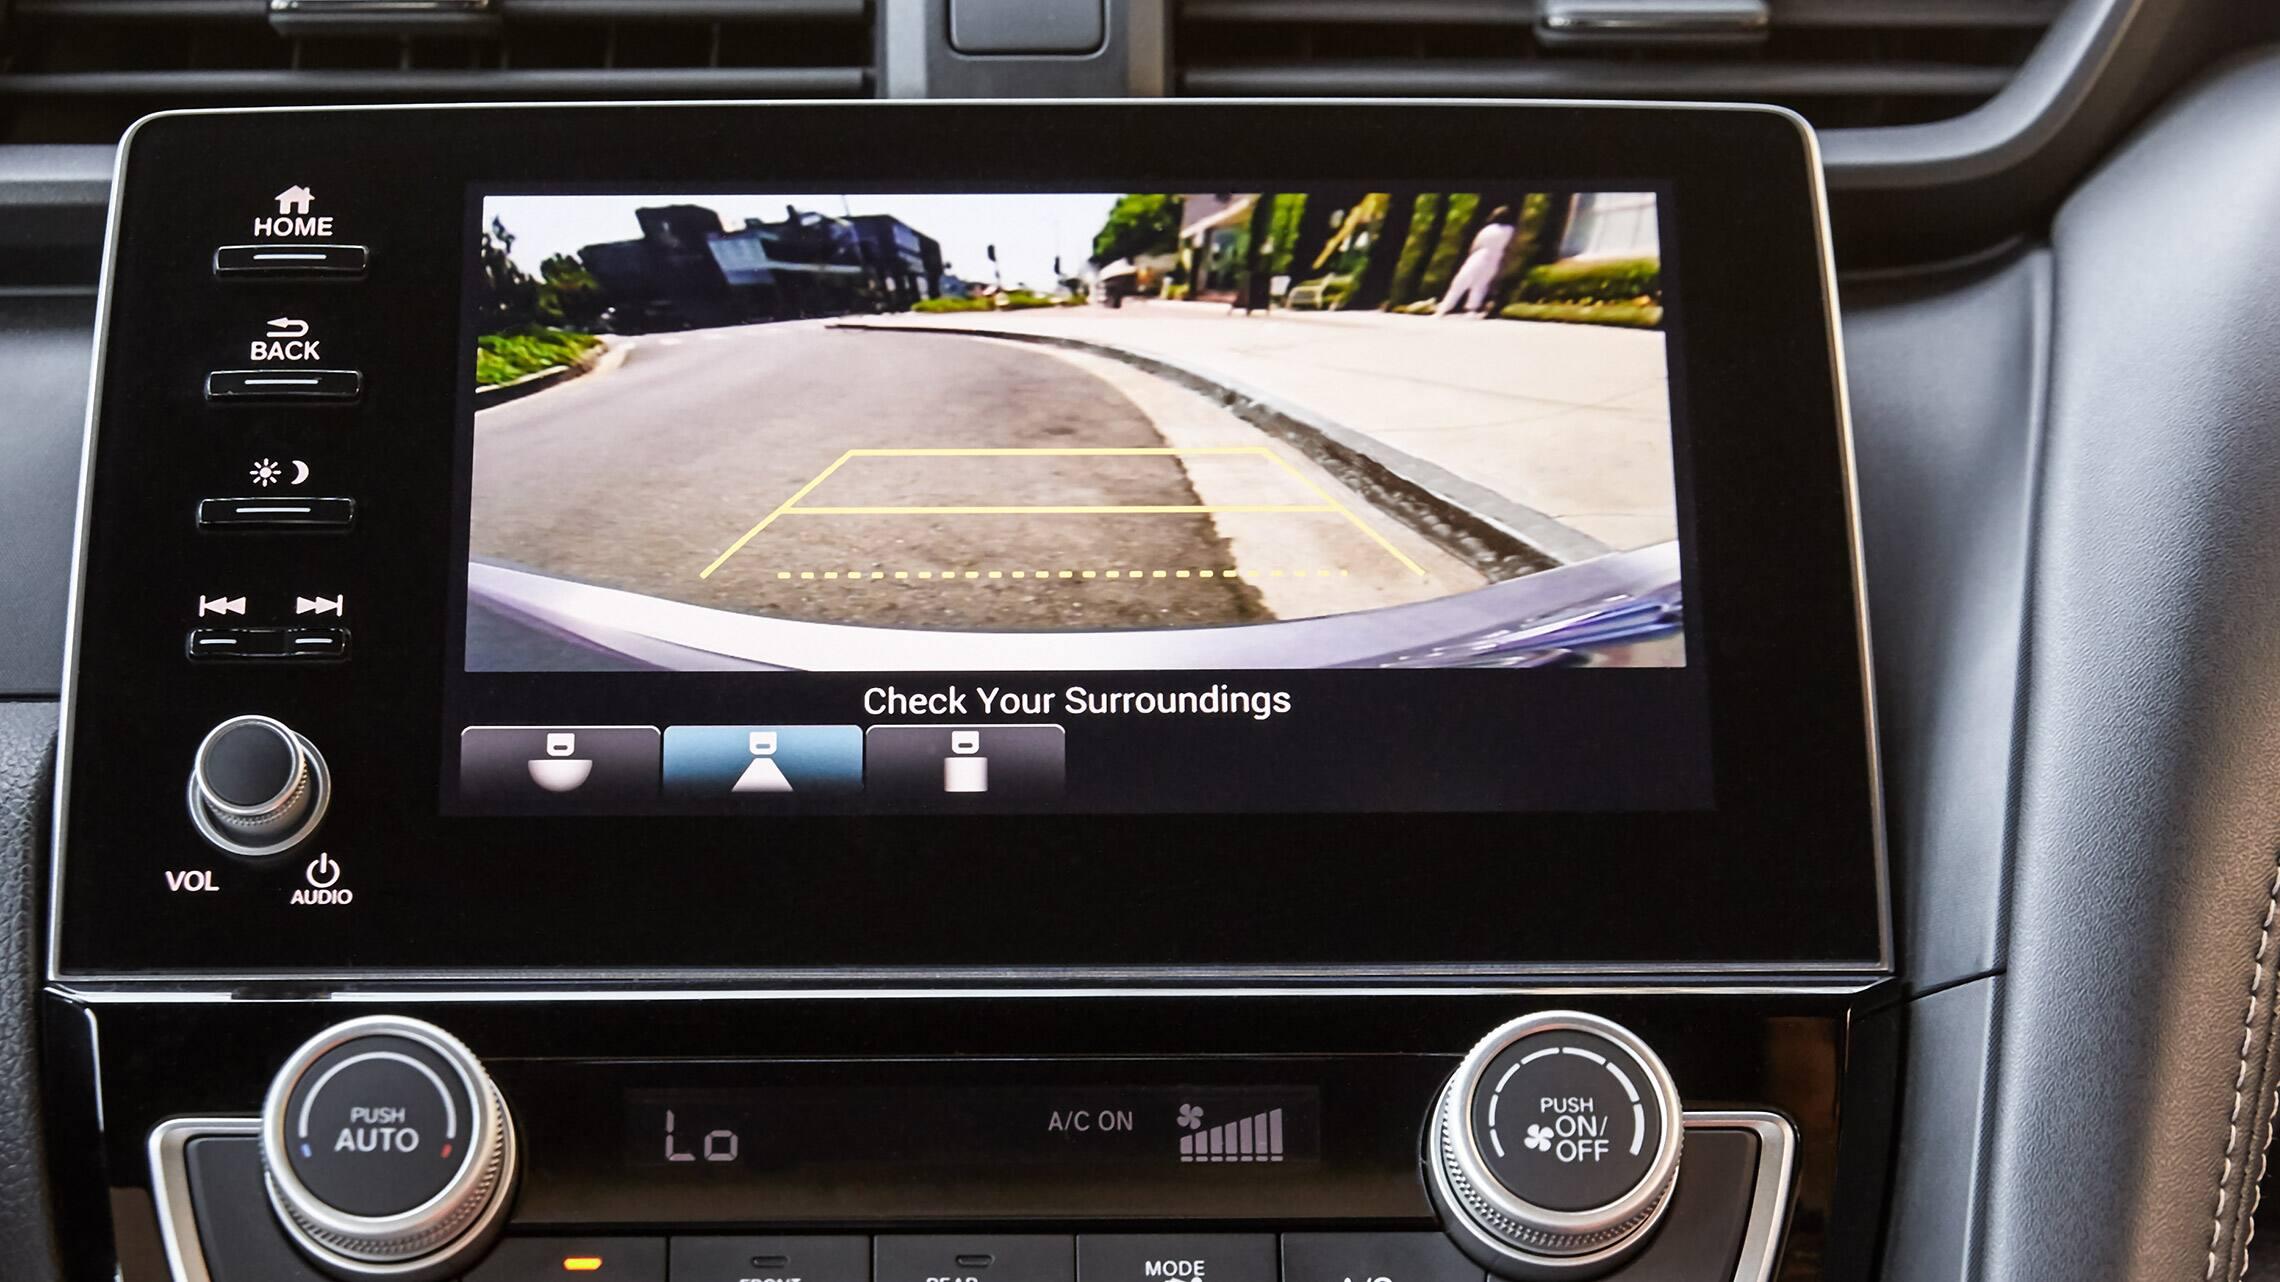 Detalle de reversa en el sistema de audio en pantalla del Honda Insight2020.